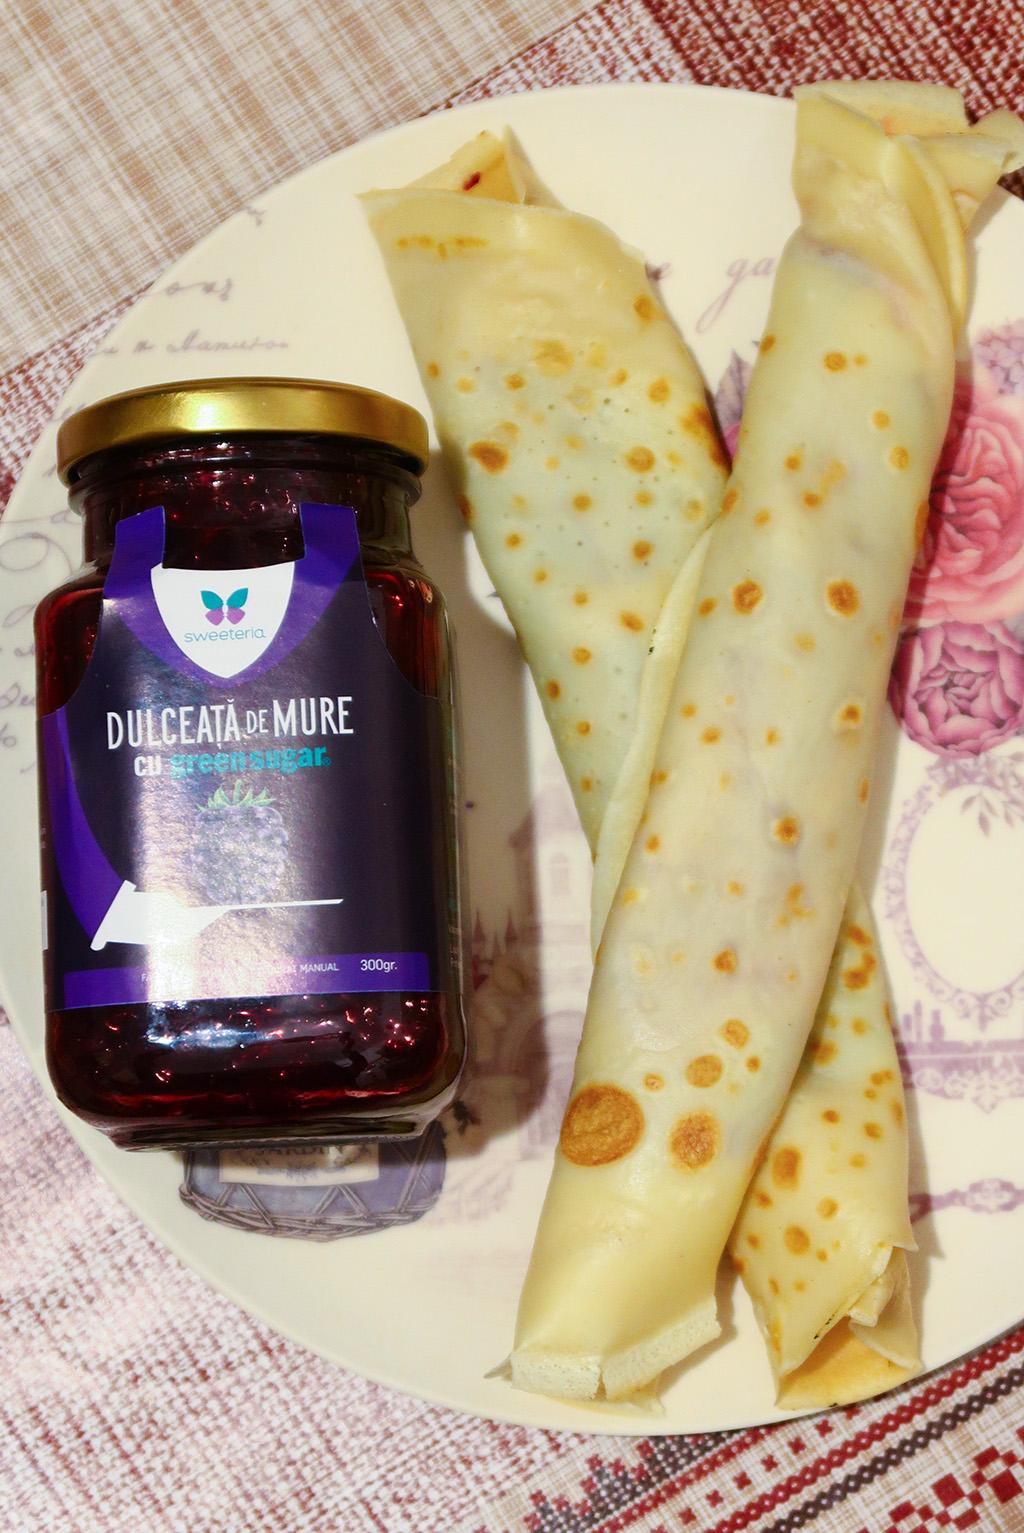 mic dejun delicios sweeteria batoane musli napolitane dulceata mure unt arahite natural bio fara zahar cereale clatite